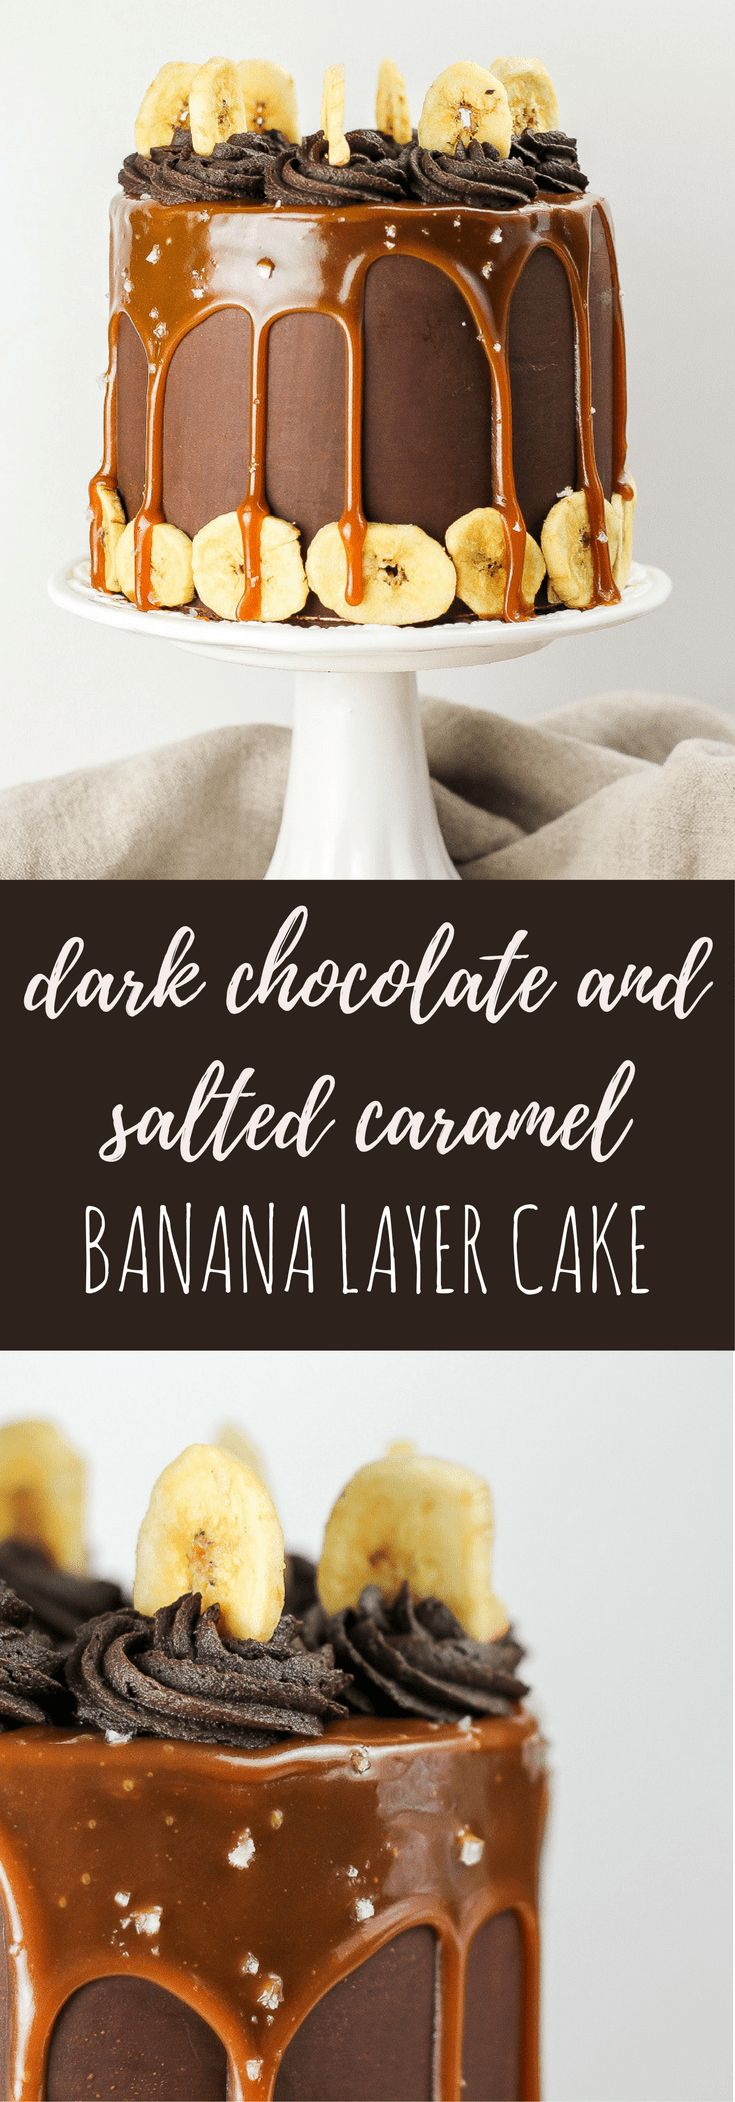 Dark Chocolate and Salted Caramel Banana Layer Cake - Flour Covered Apron